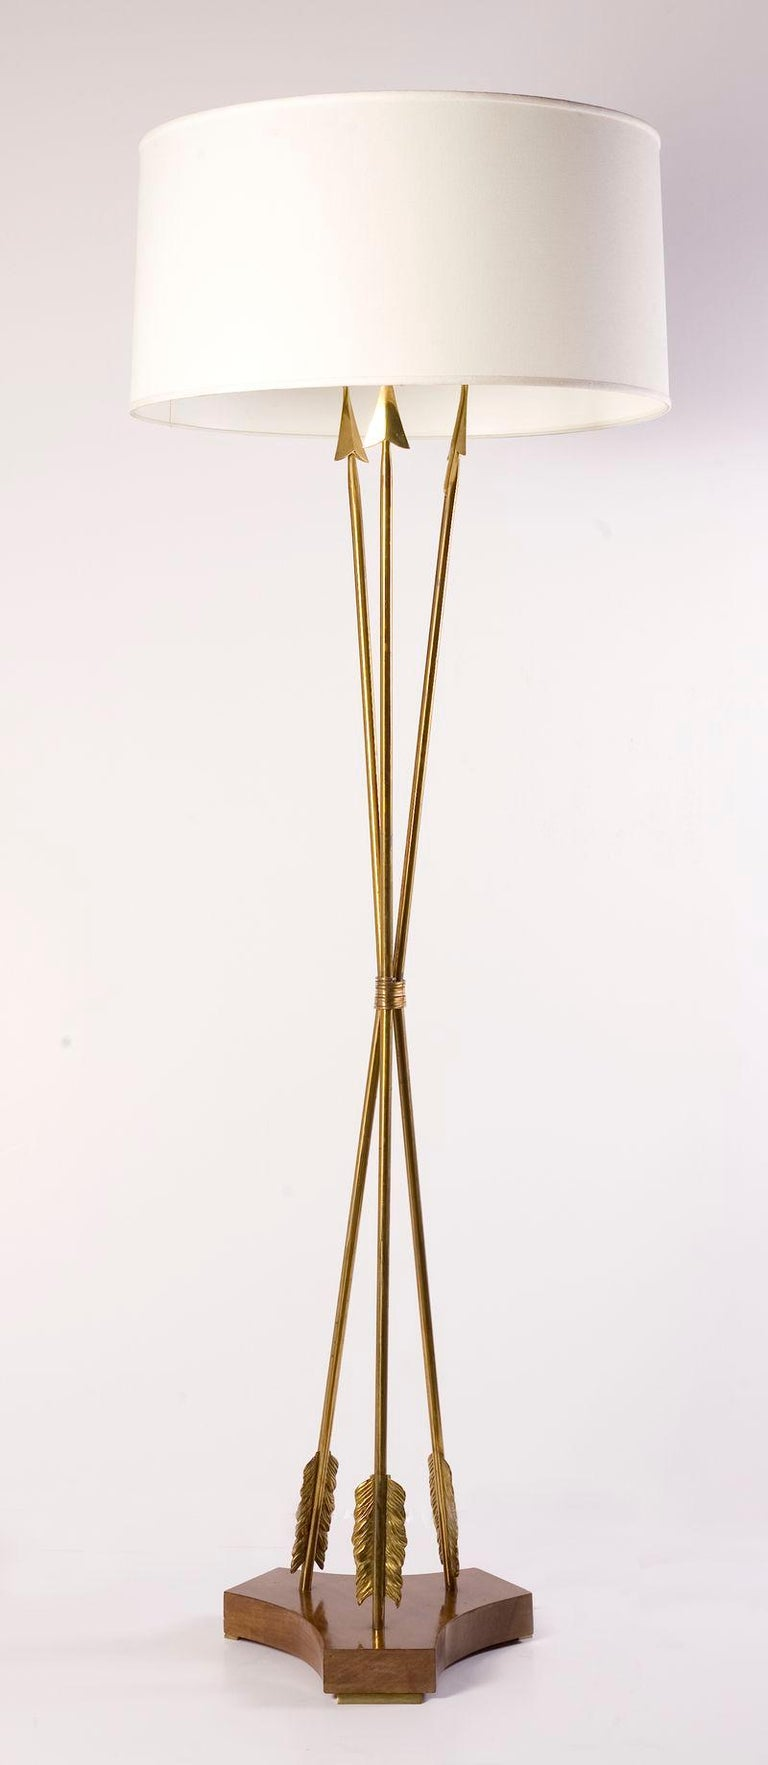 Mid-Century Modern Mid-Century Floor Lamp, France, C. 1950 For Sale